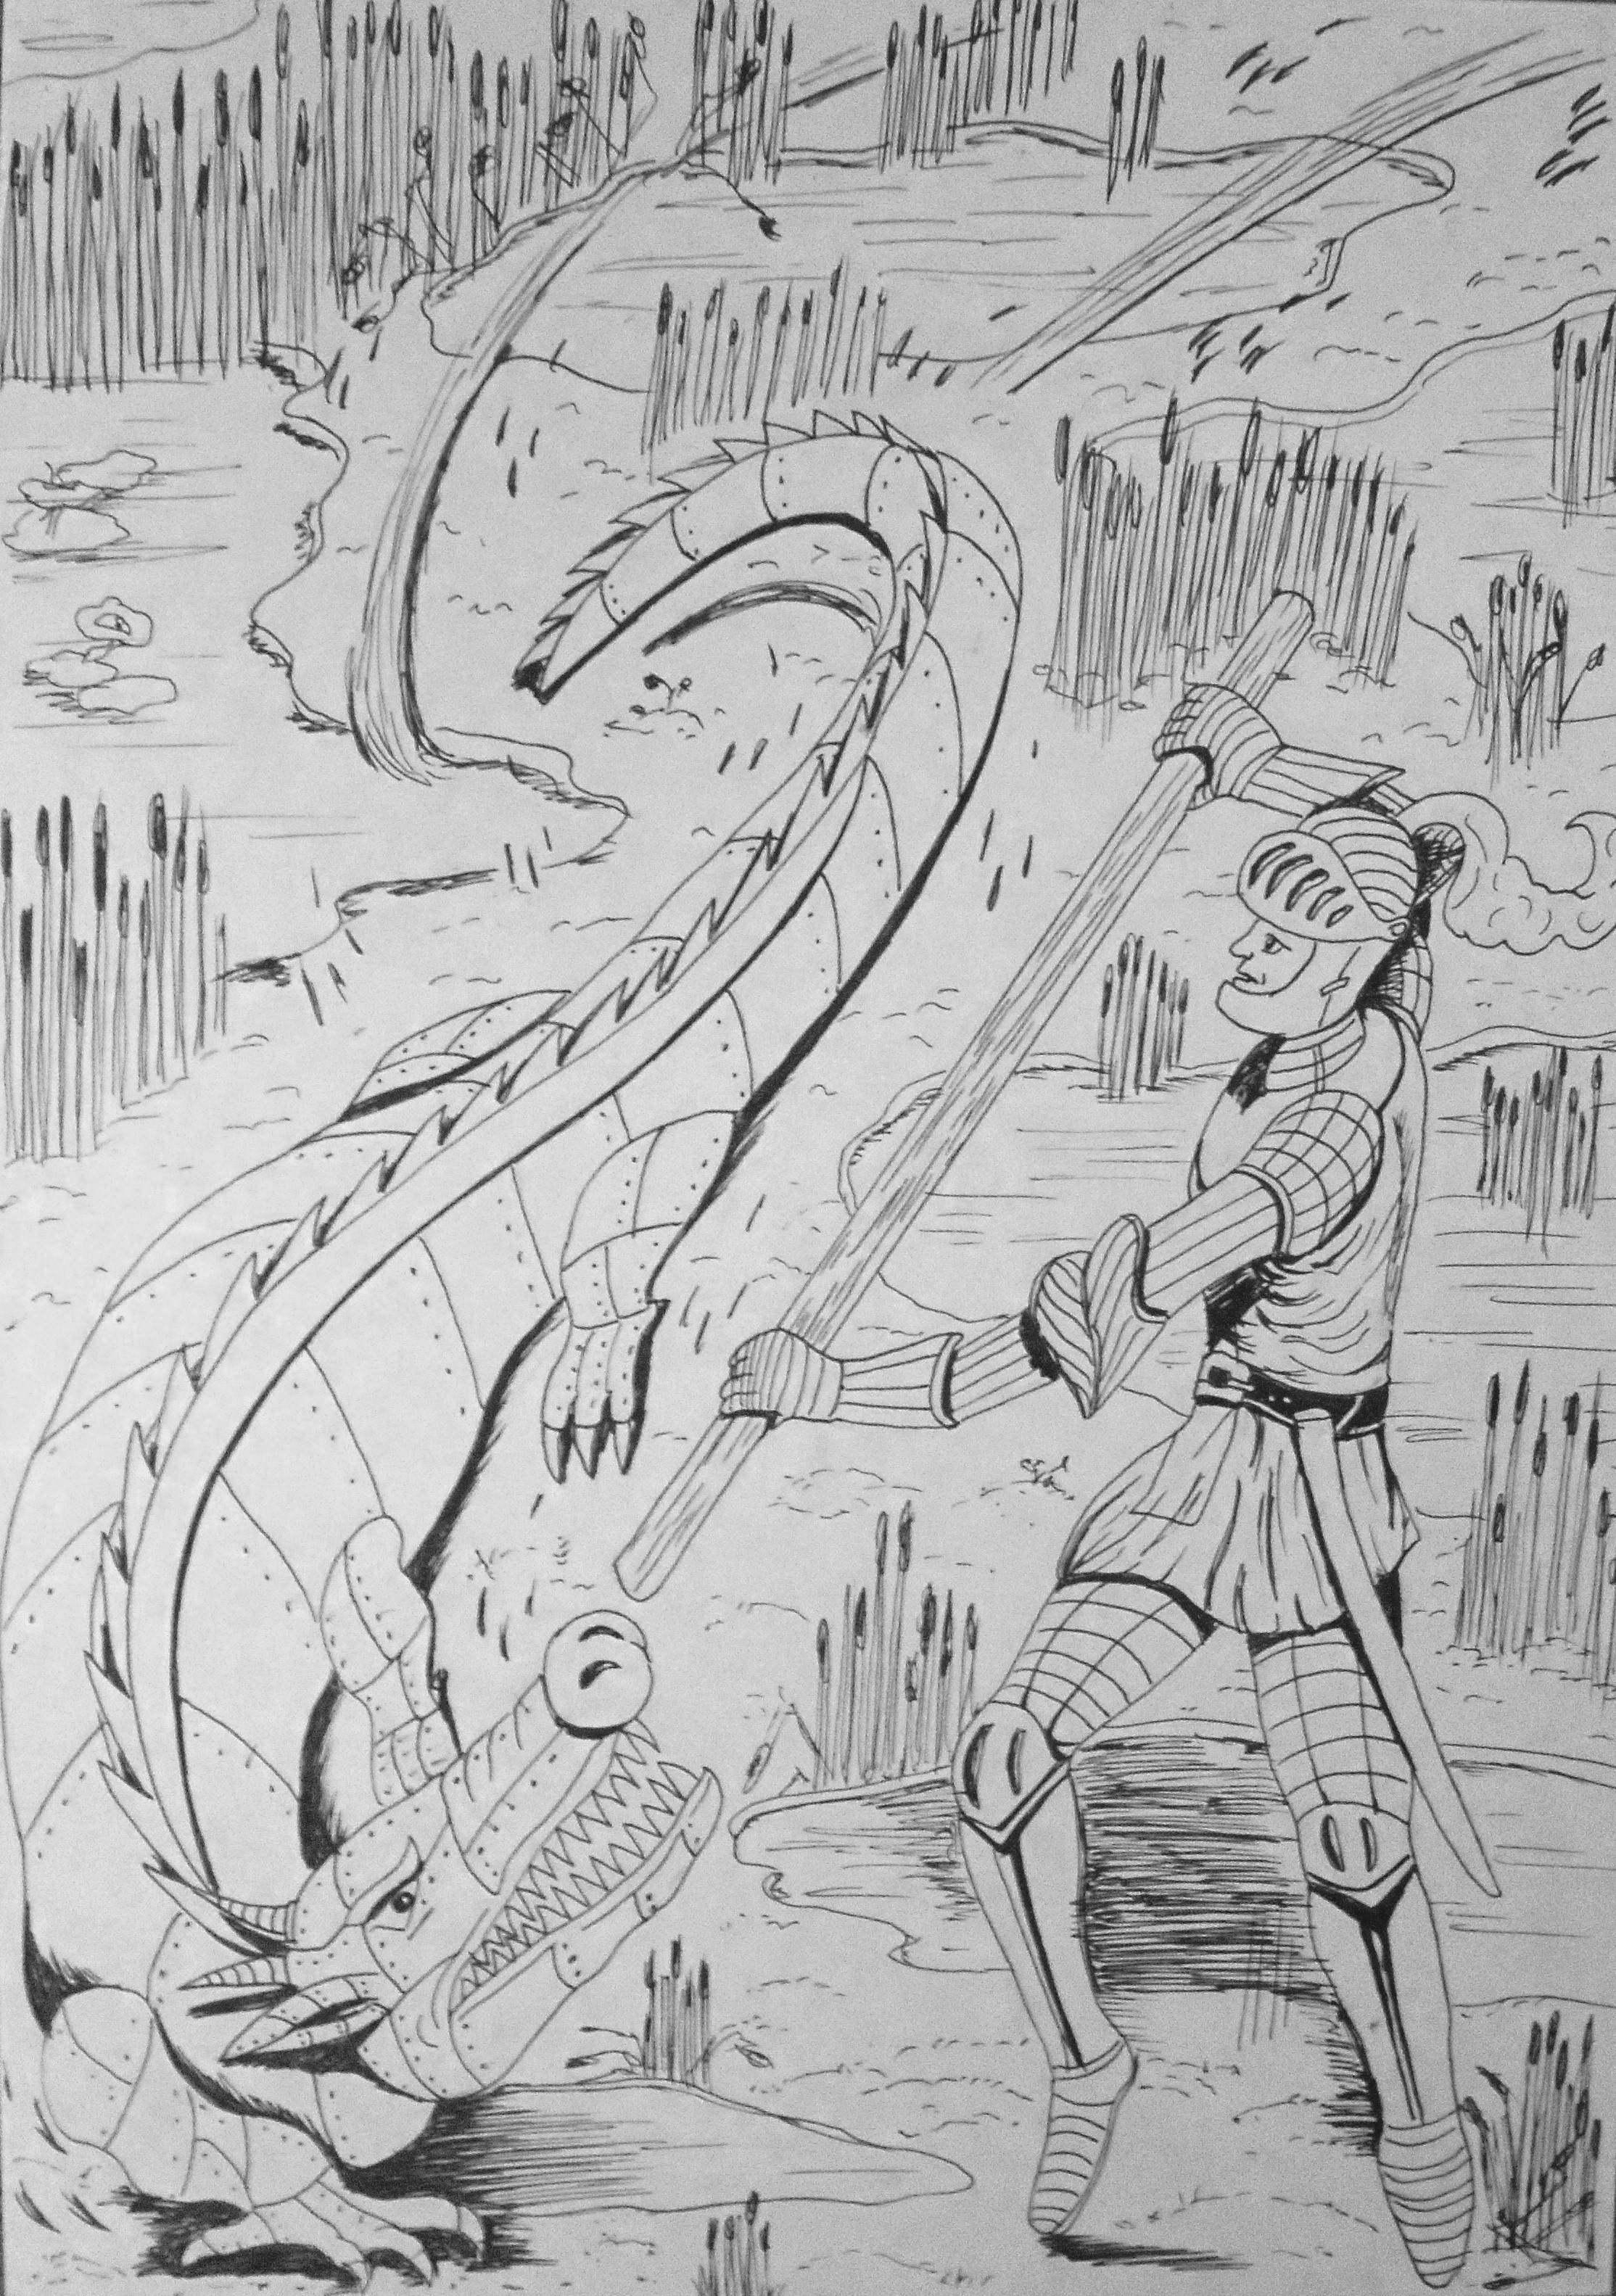 Leotheric vs Tharagavverug